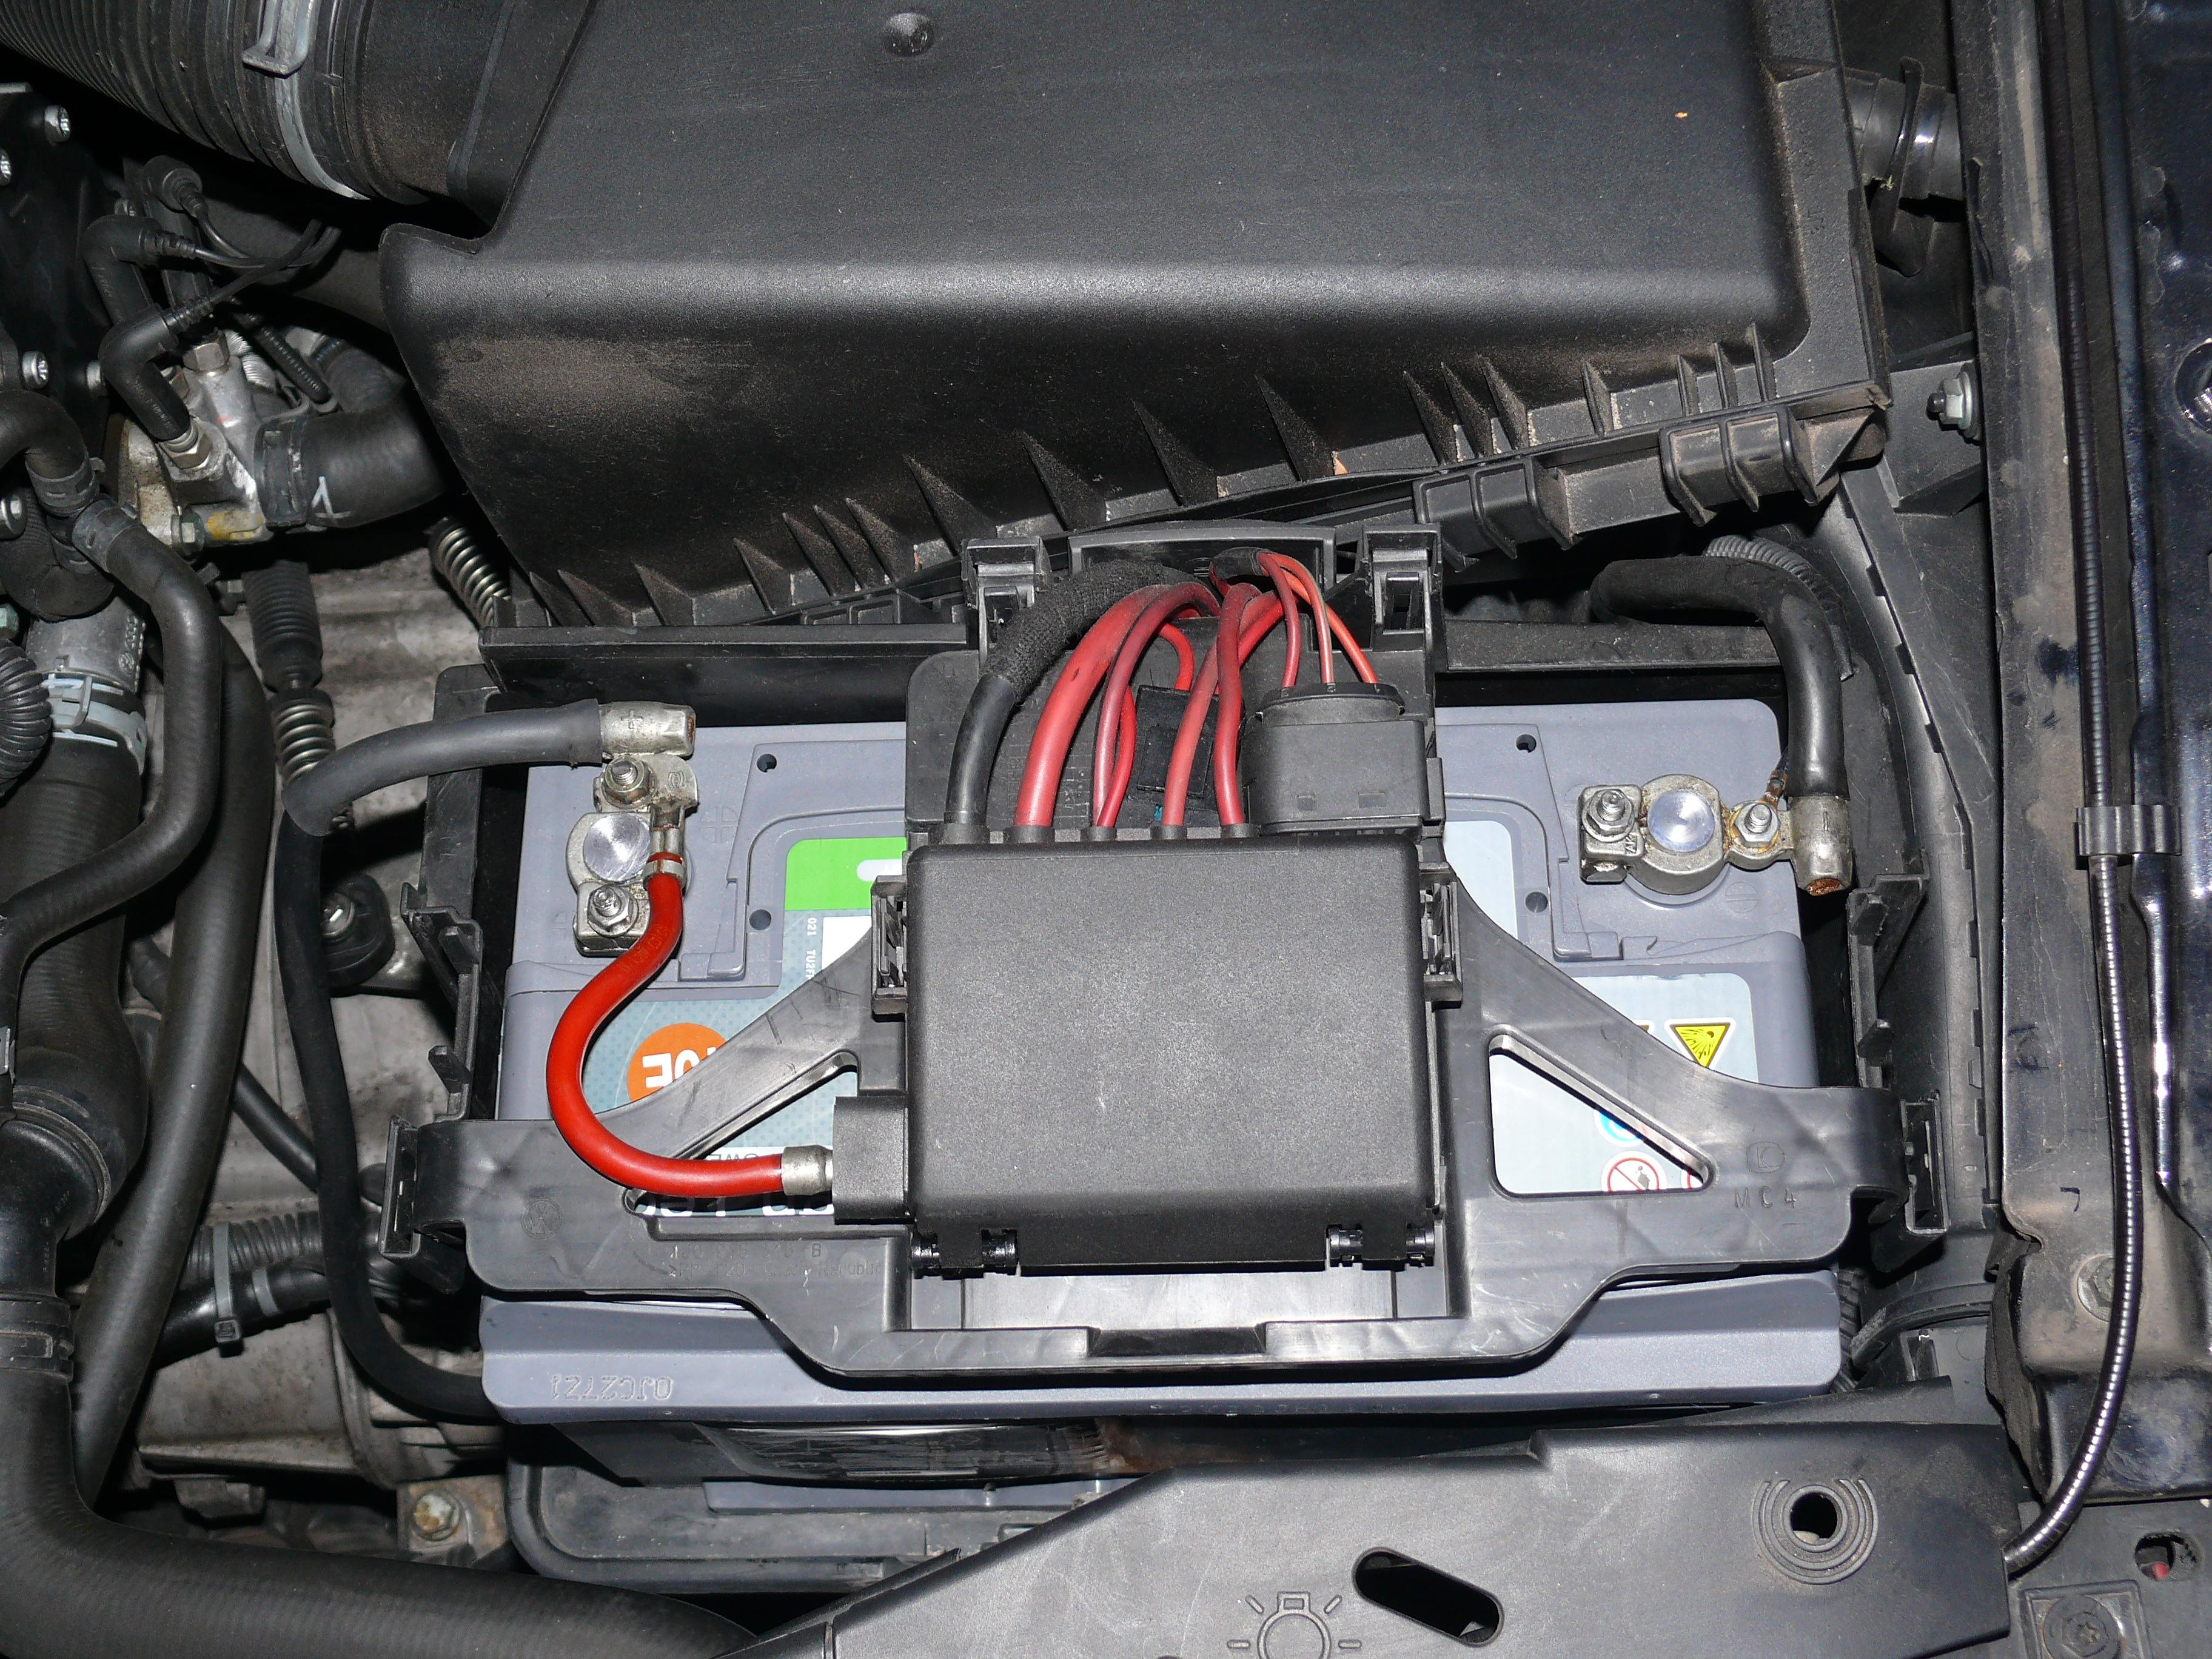 Batterie Golf 4 : batterie golf 4 ~ Carolinahurricanesstore.com Idées de Décoration